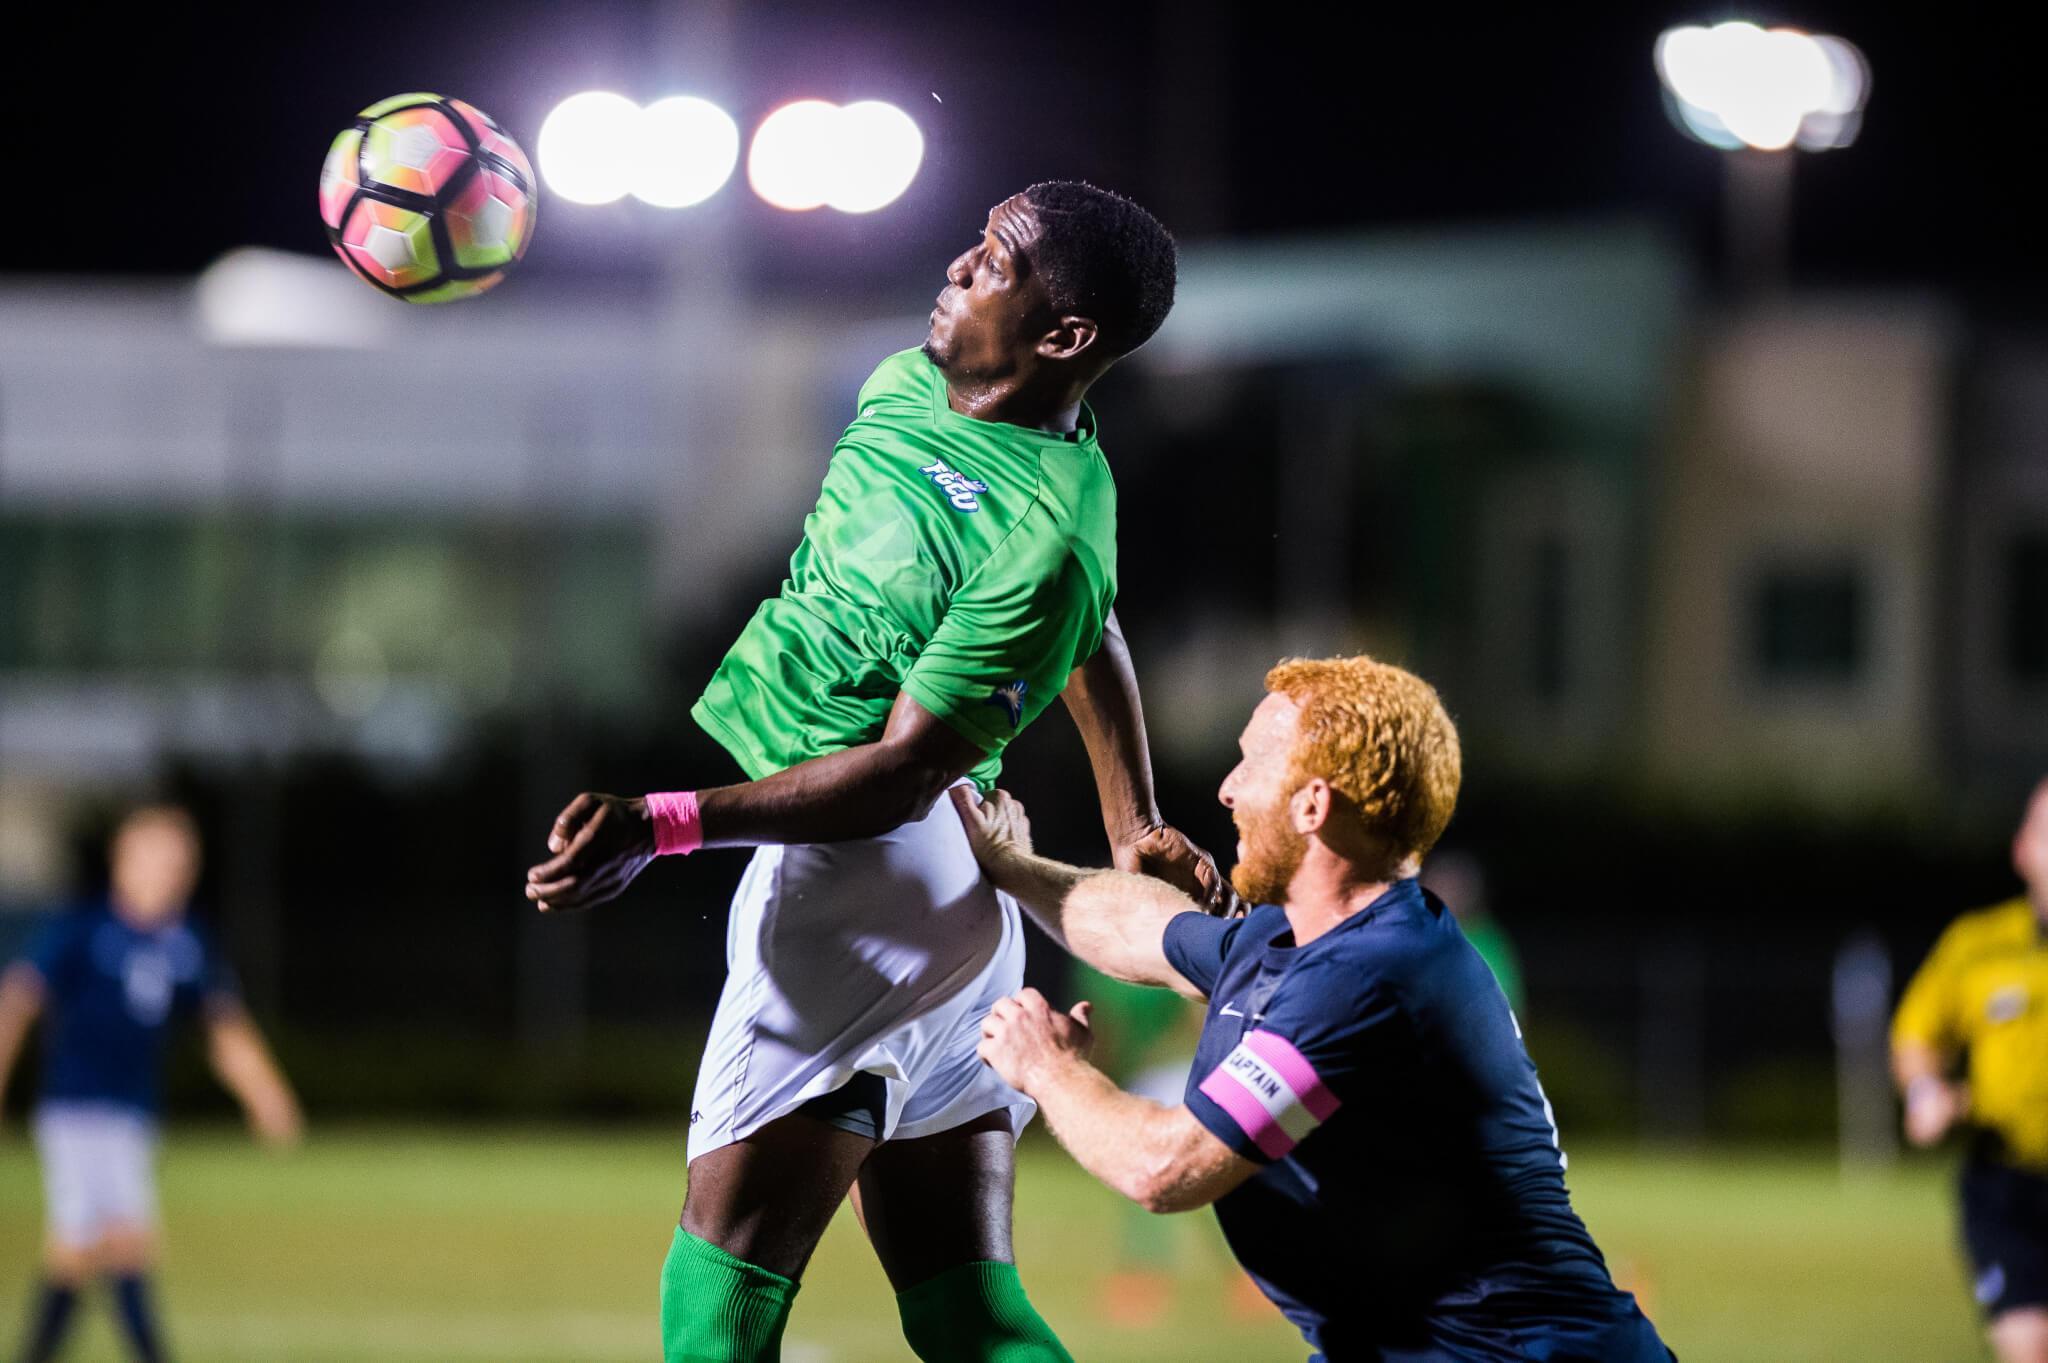 No. 20 men's soccer comes back for 2-1 victory over Jacksonville